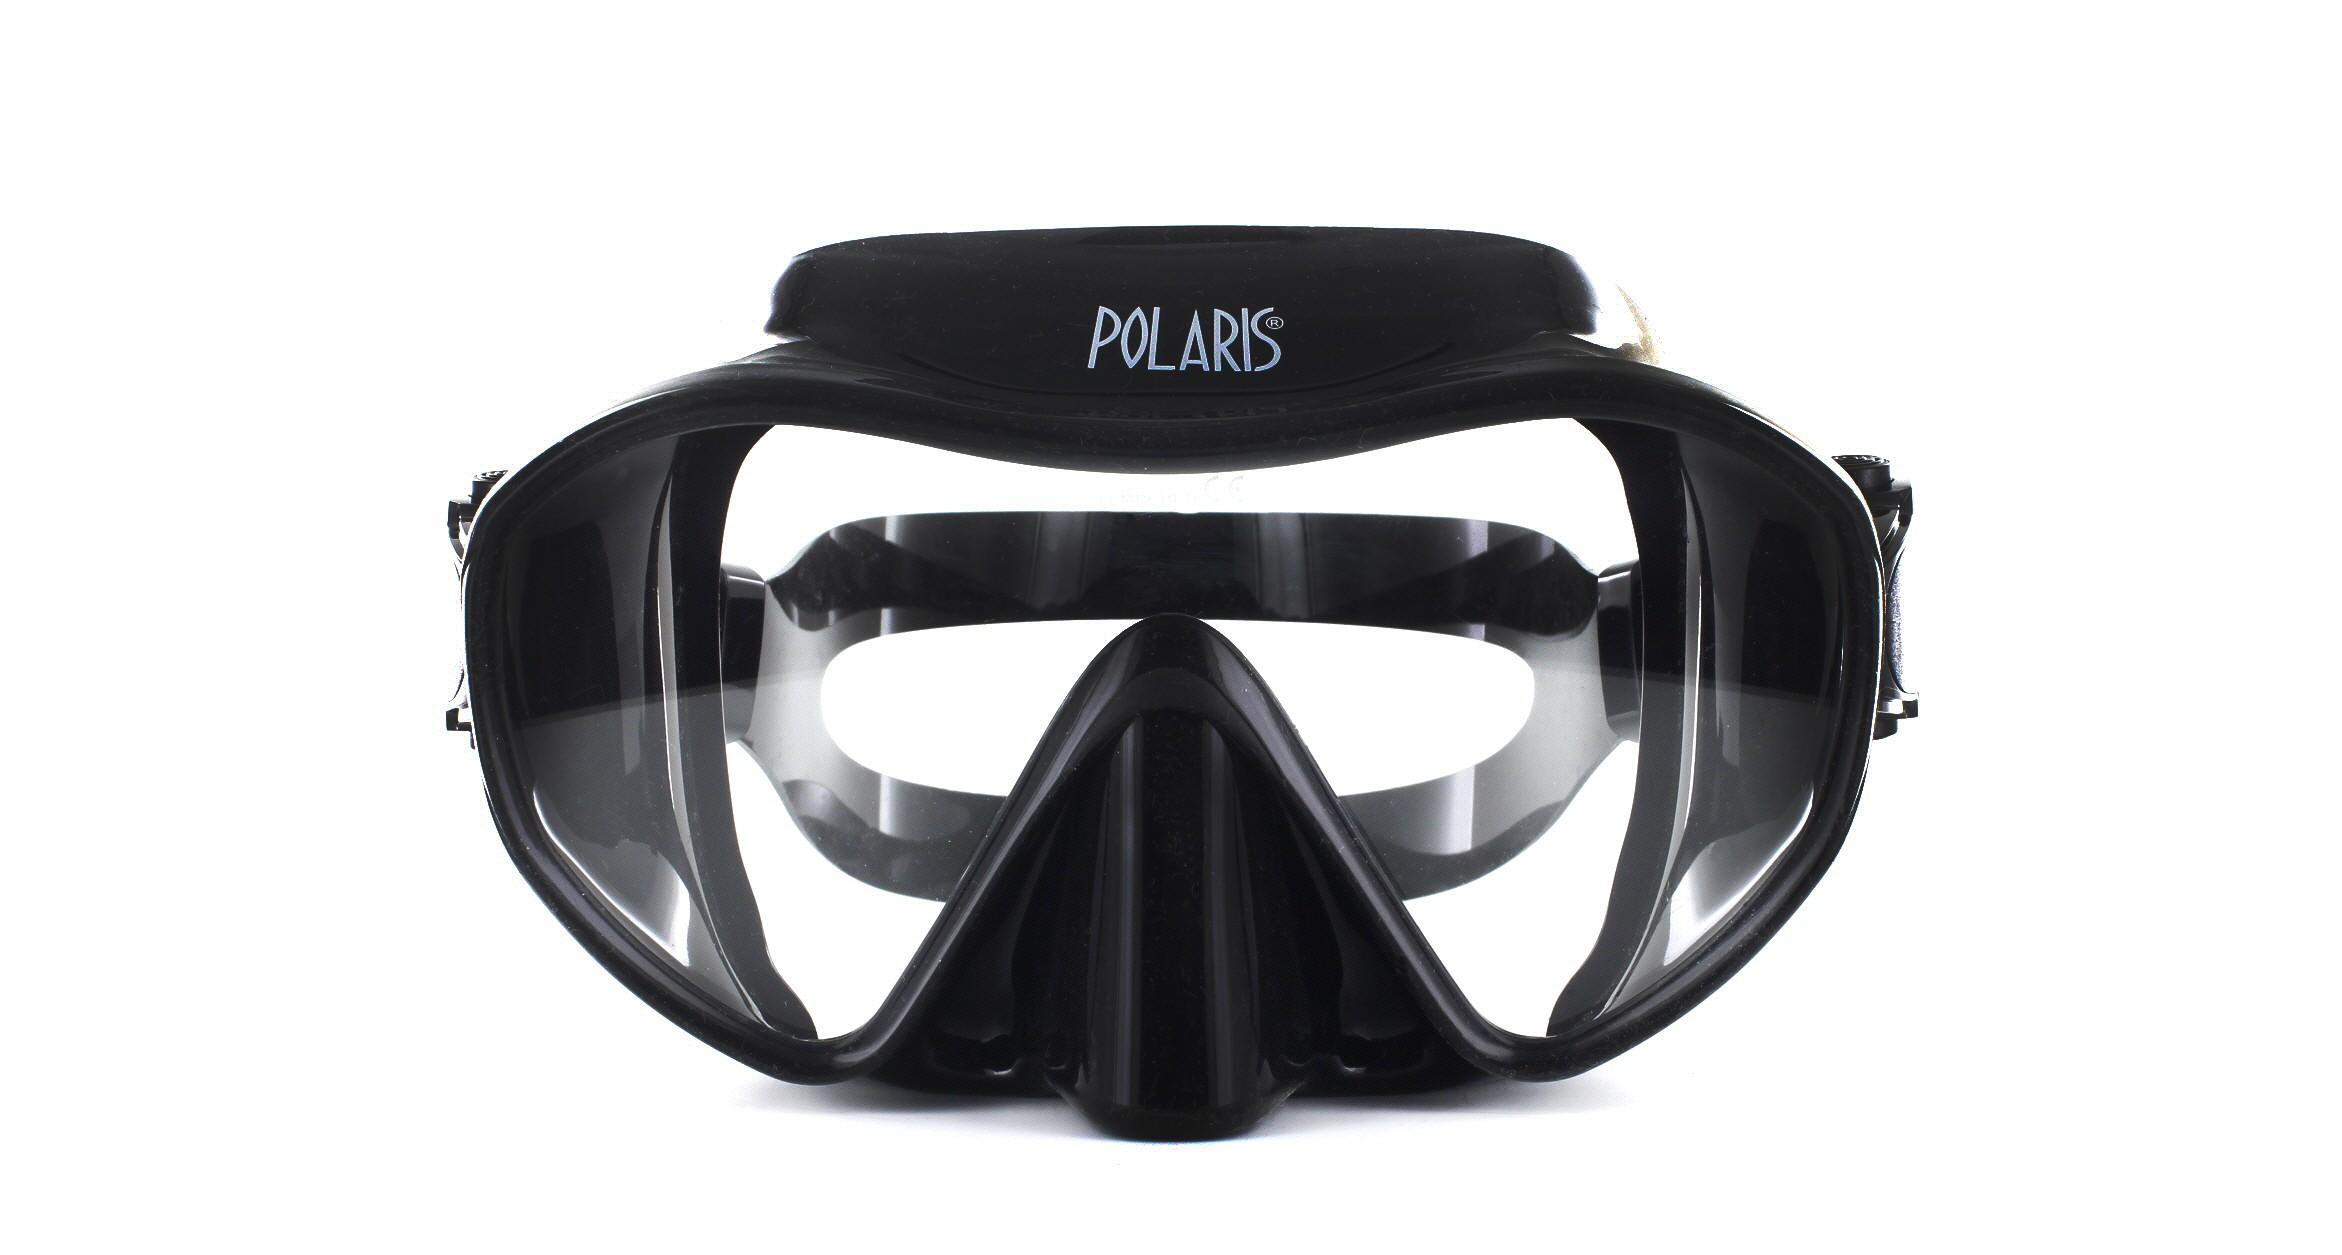 Polaris Frameless